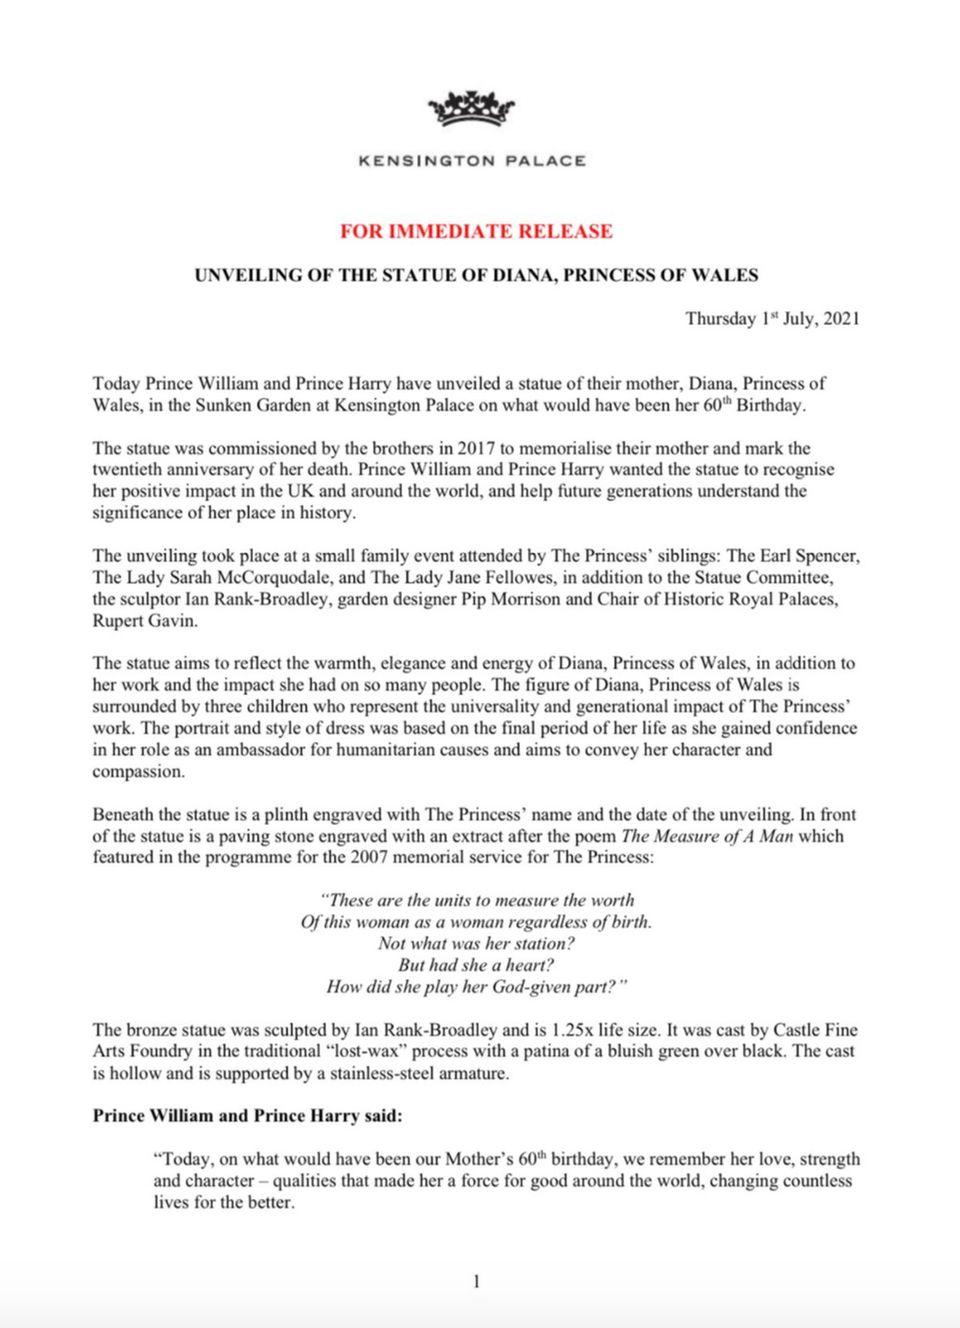 Das offizielle Statement des Palastes